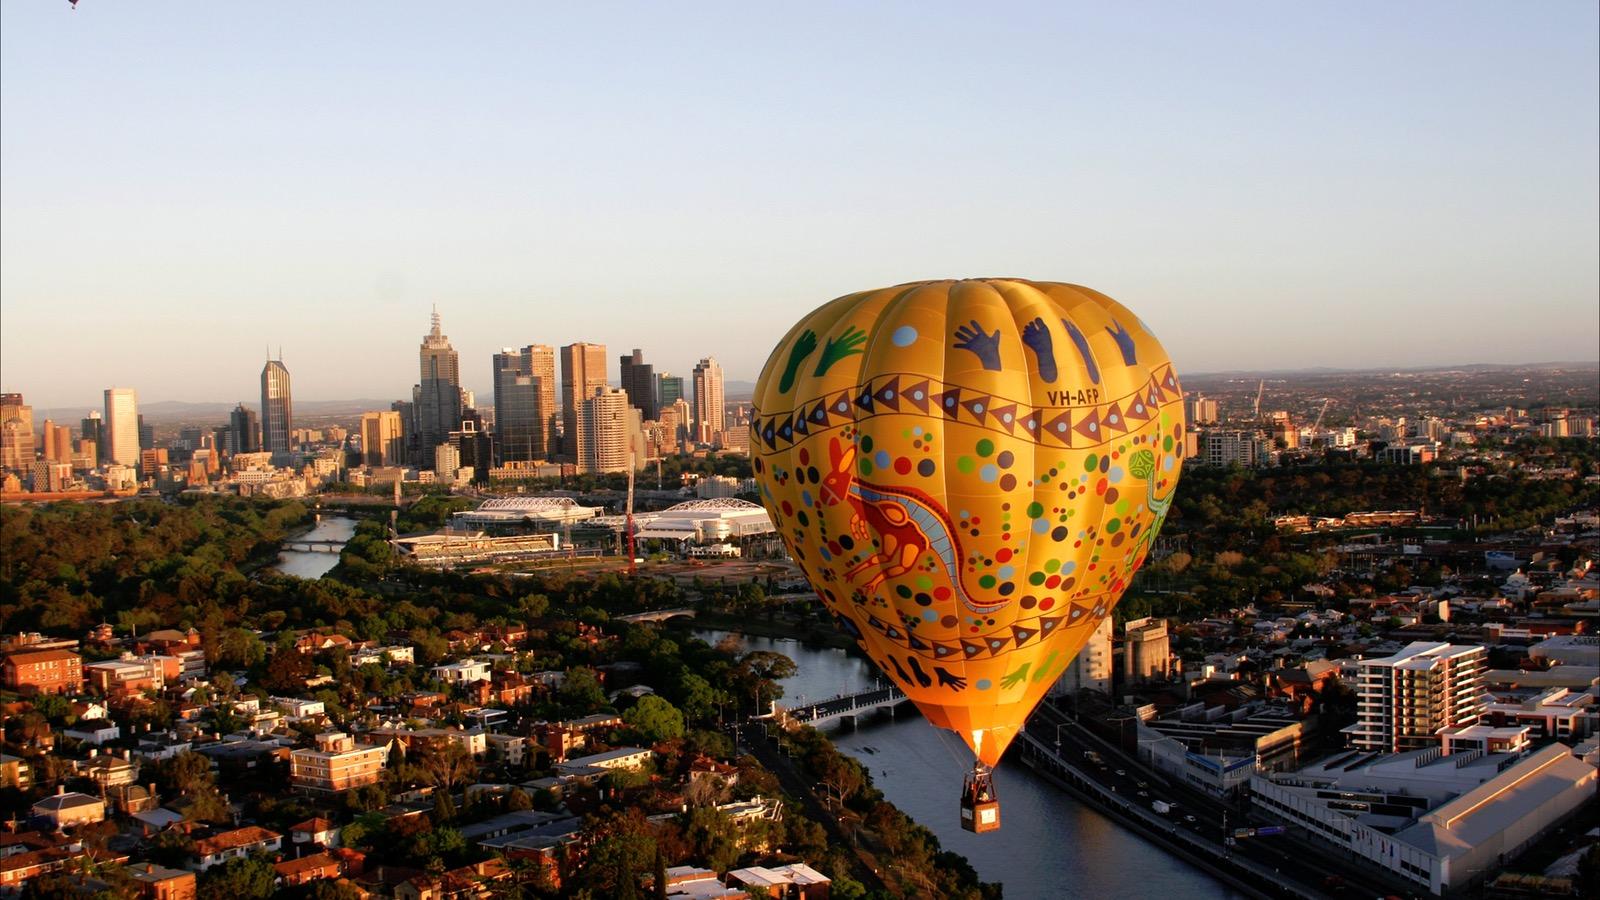 Melbourne hot air balloon